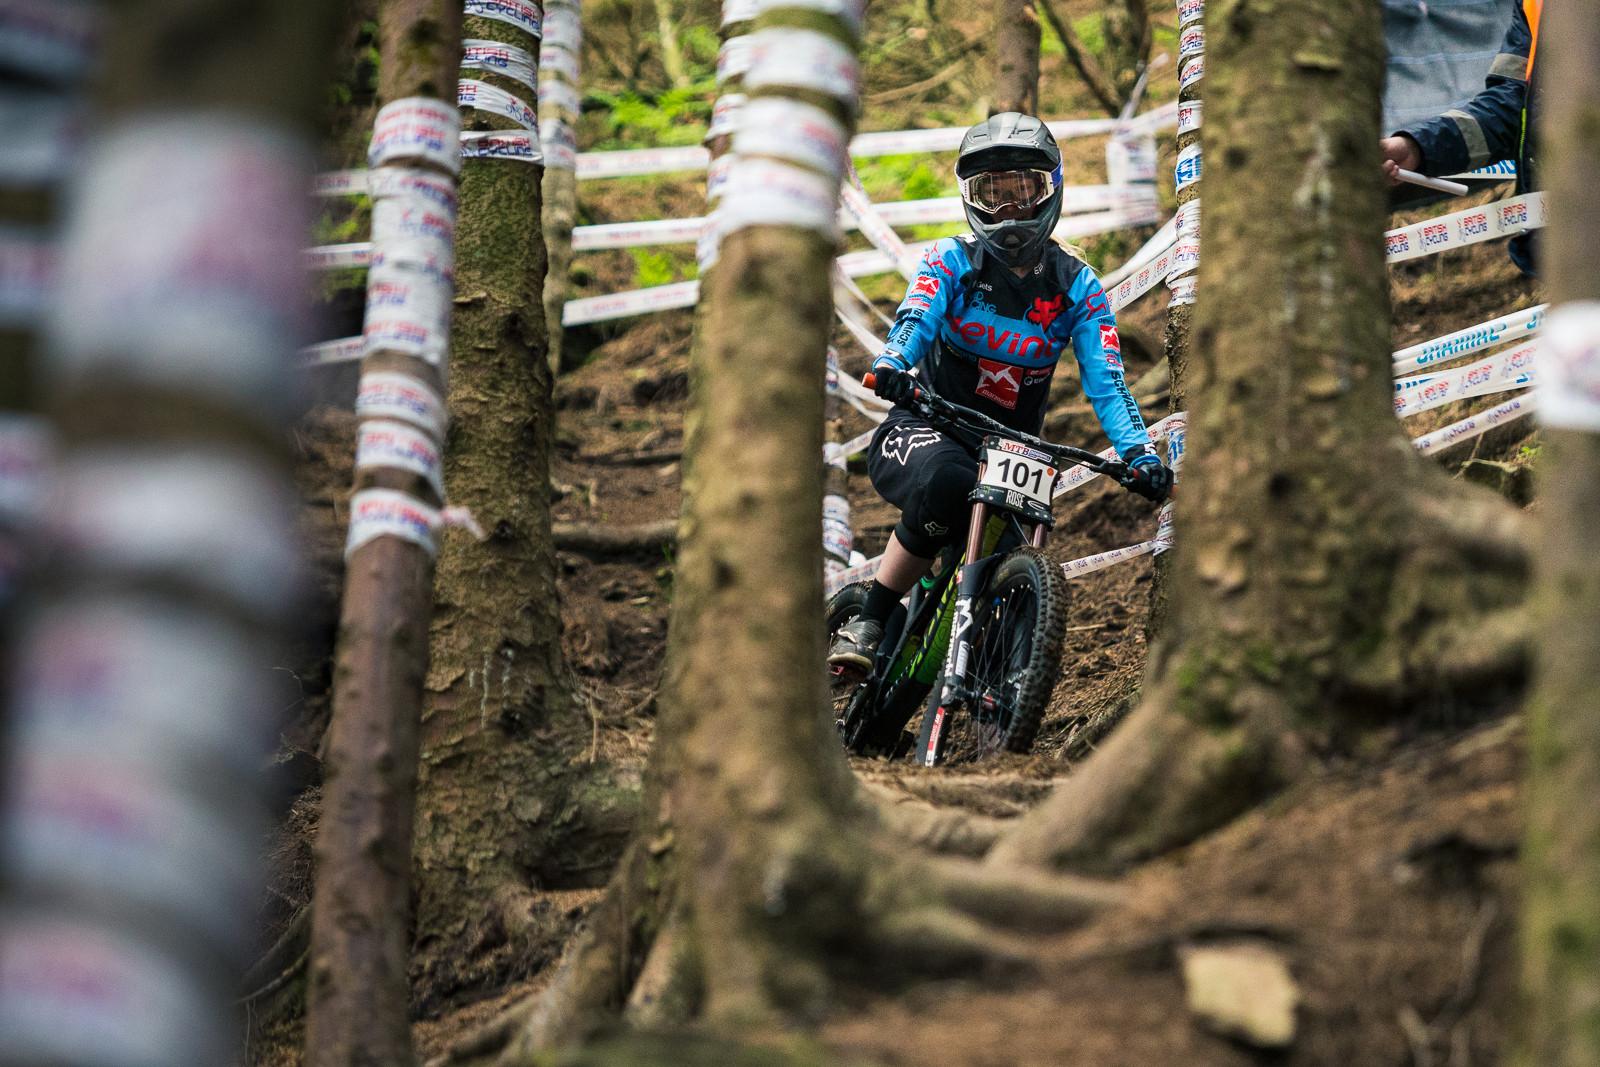 Tahnée Seagrave, BDS Llangollen - RACE REPORT - British Downhill Series Llangollen - Mountain Biking Pictures - Vital MTB